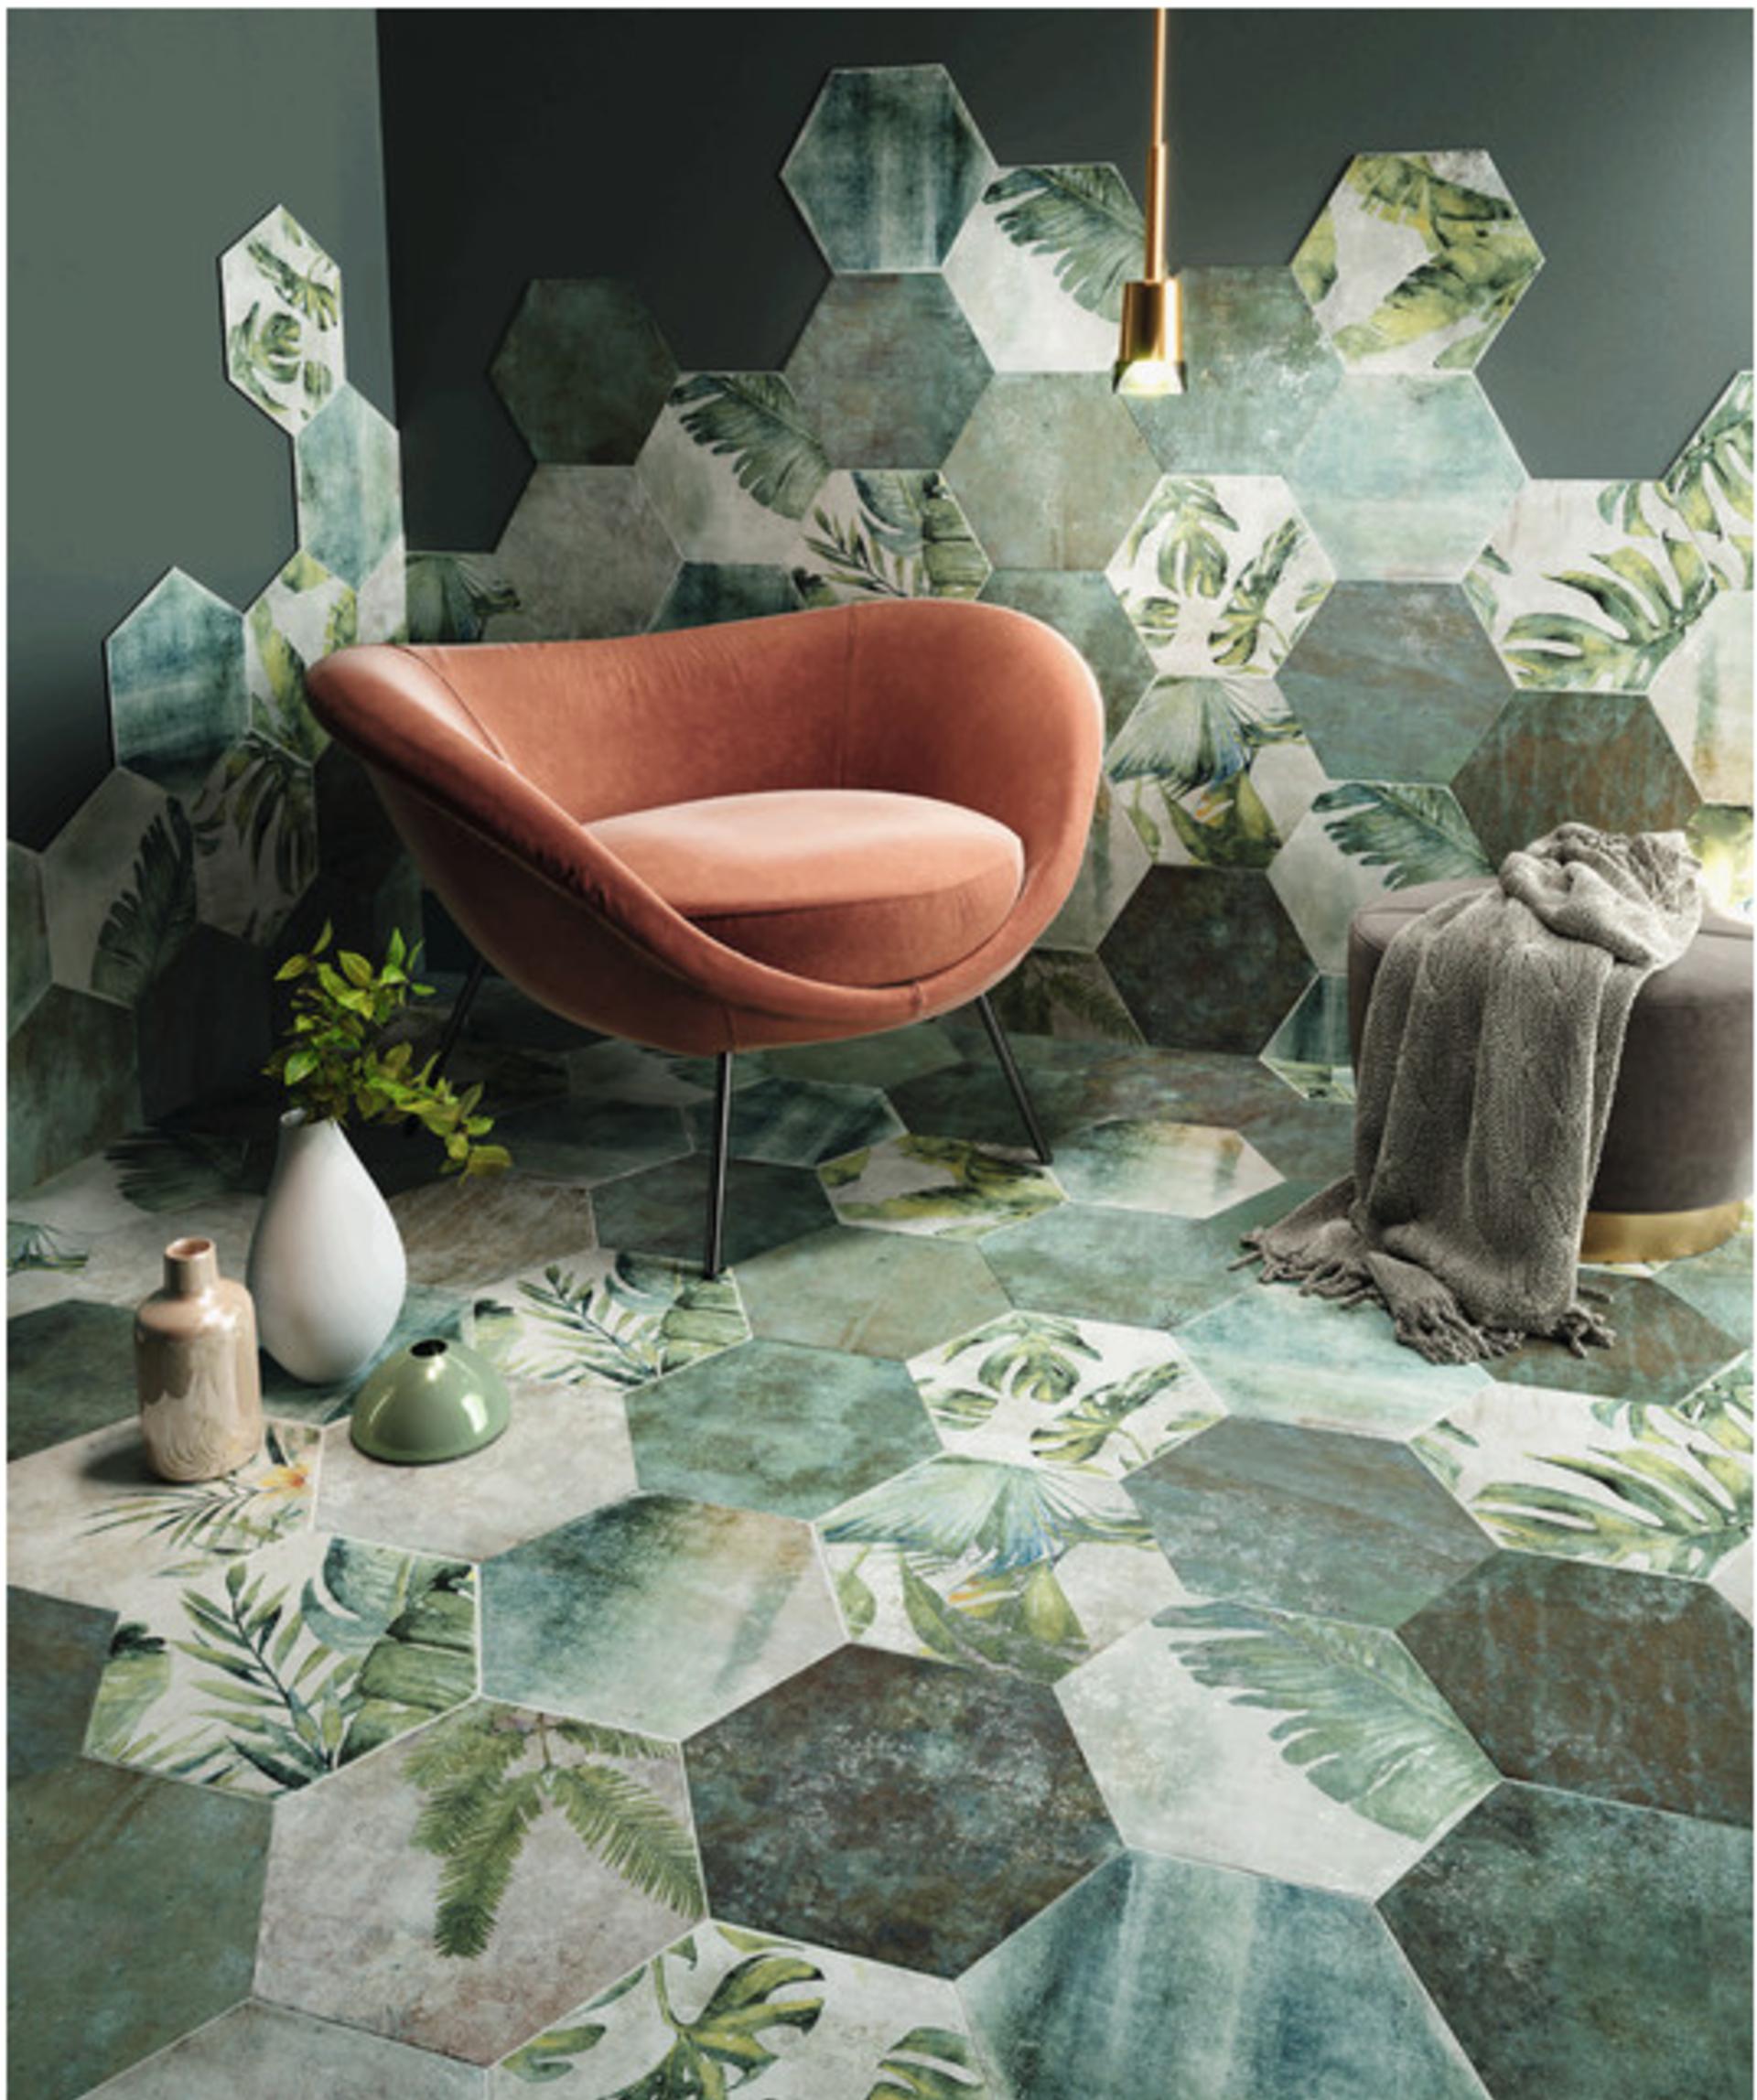 Top Trends From This Falls European Interior Design Fairs